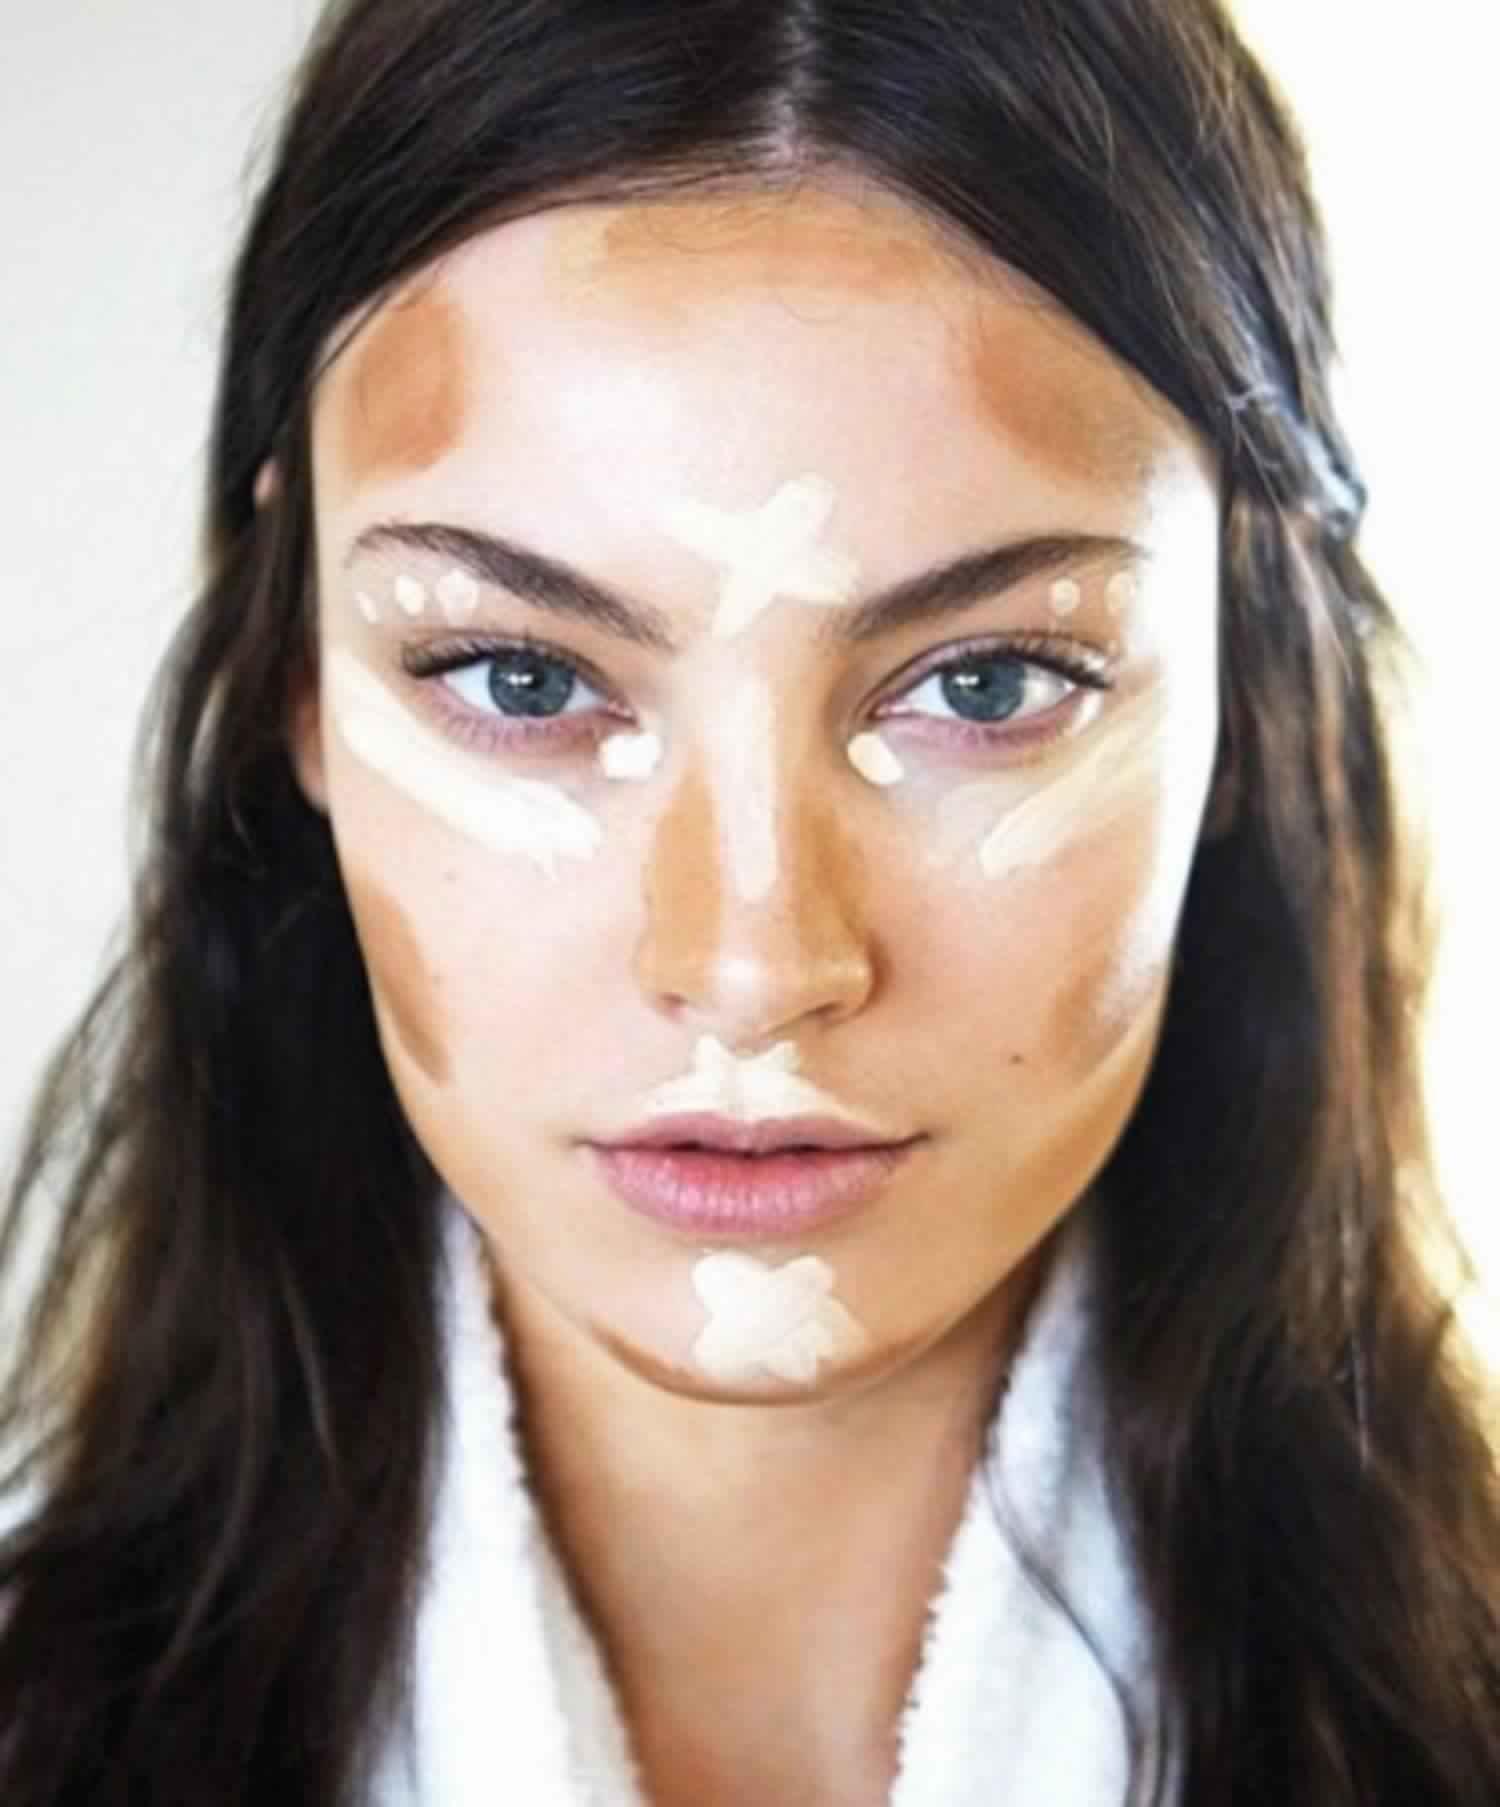 skulpturirovanie-lica-foto-poshagovo_ (12)